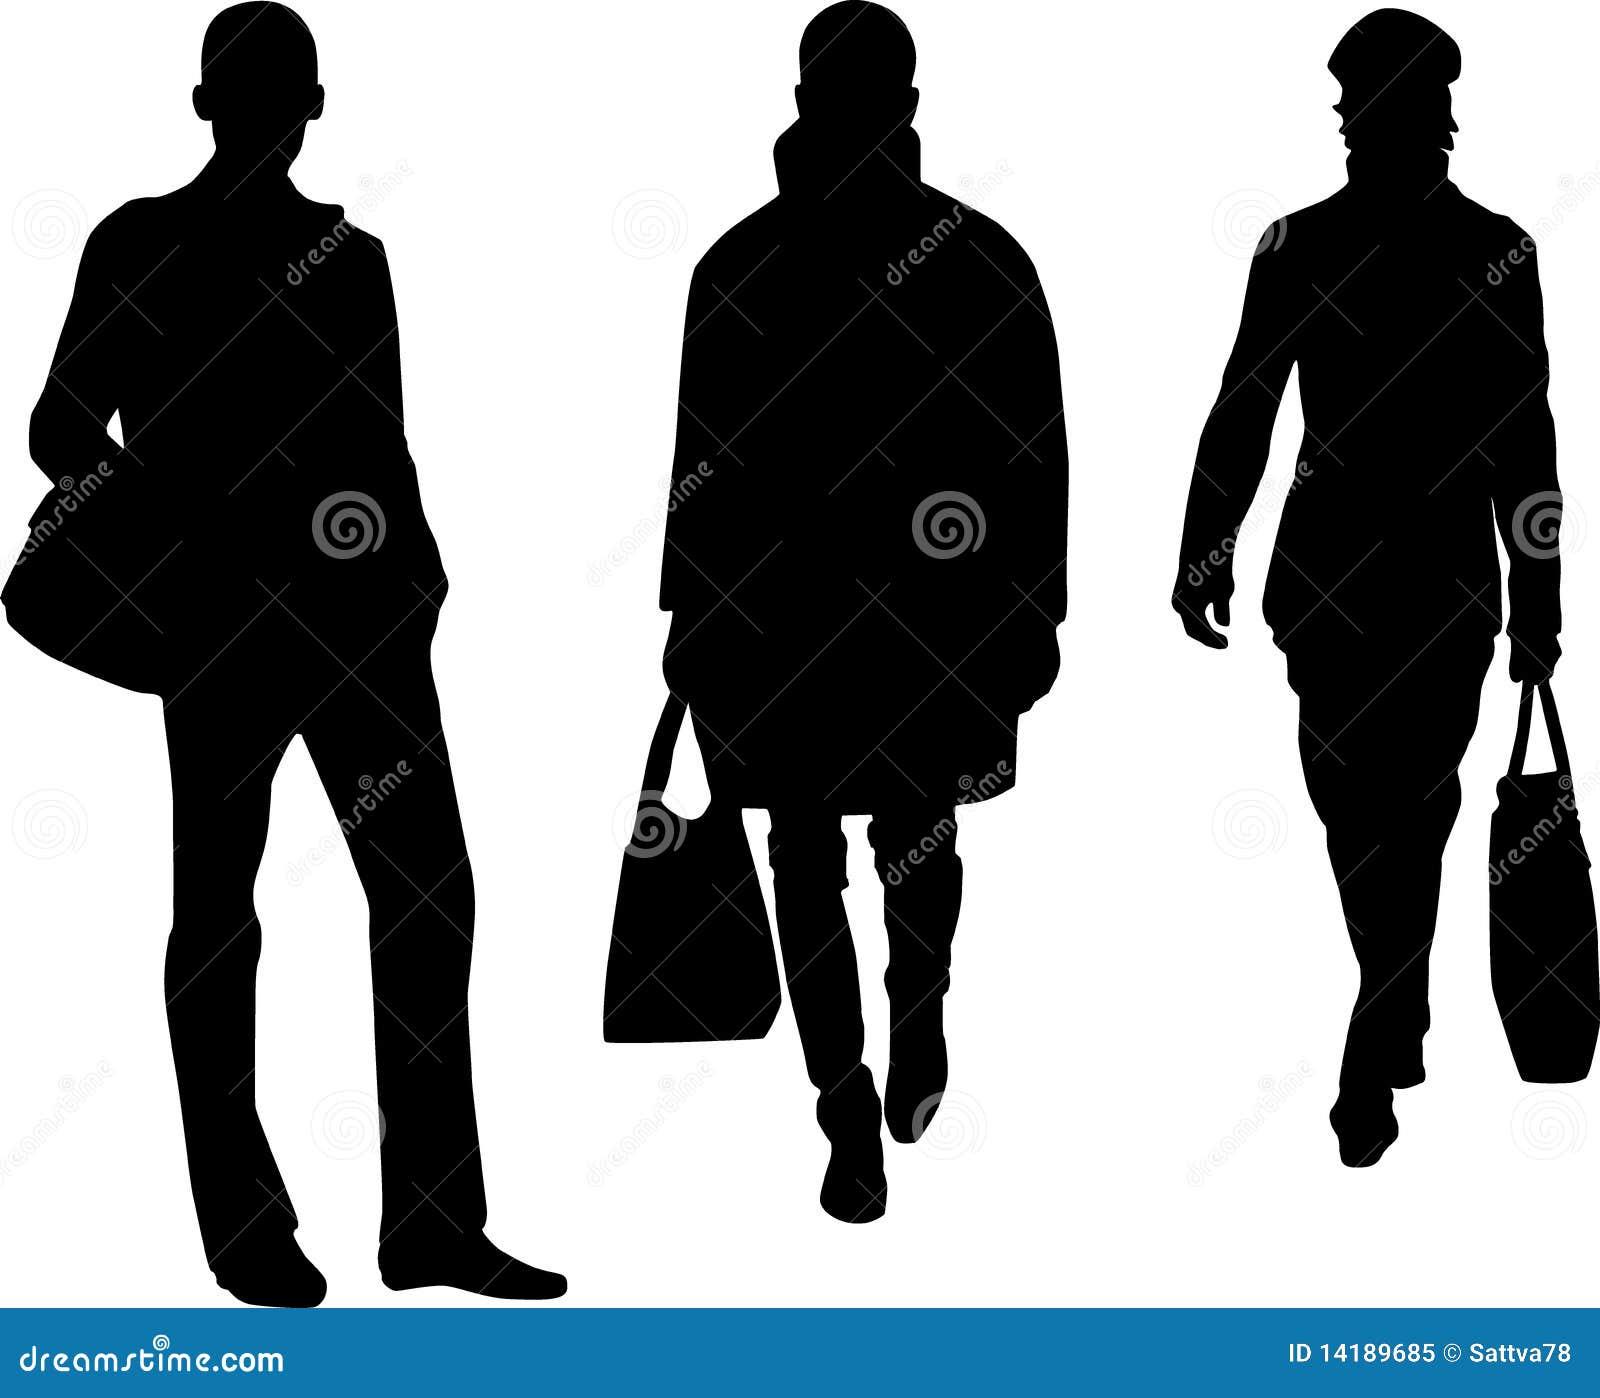 39945f9ebe6 Silhouette fashion men stock illustration of model jpg 1300x1153 Man  silhouette fashion